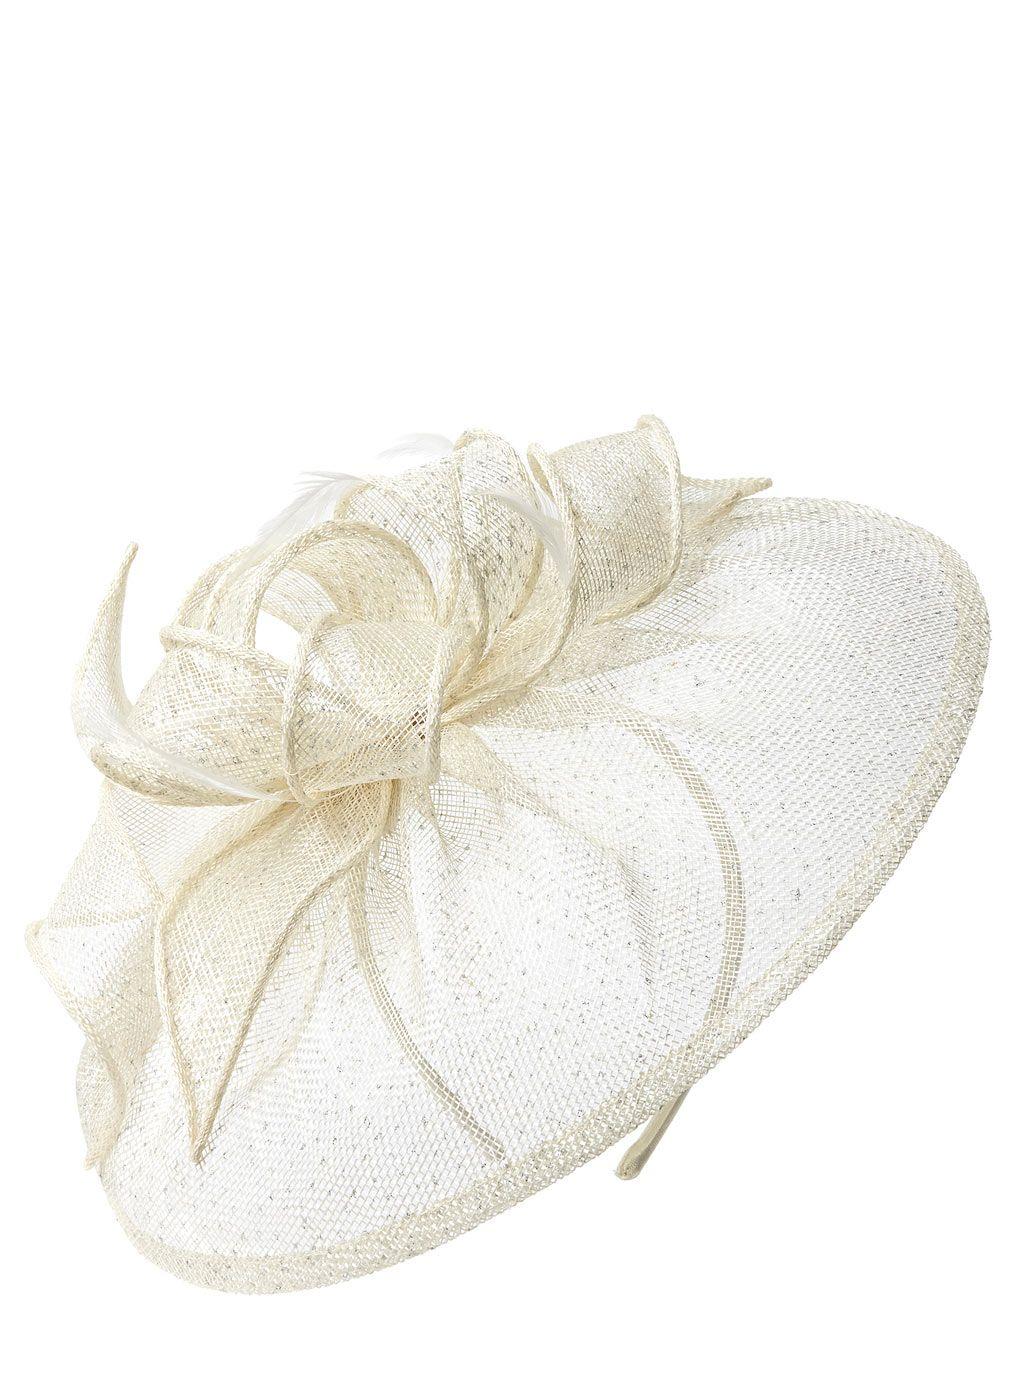 Mothers Of The Bride Groom Outfits Fascinator Hatsfascinatorsgroom